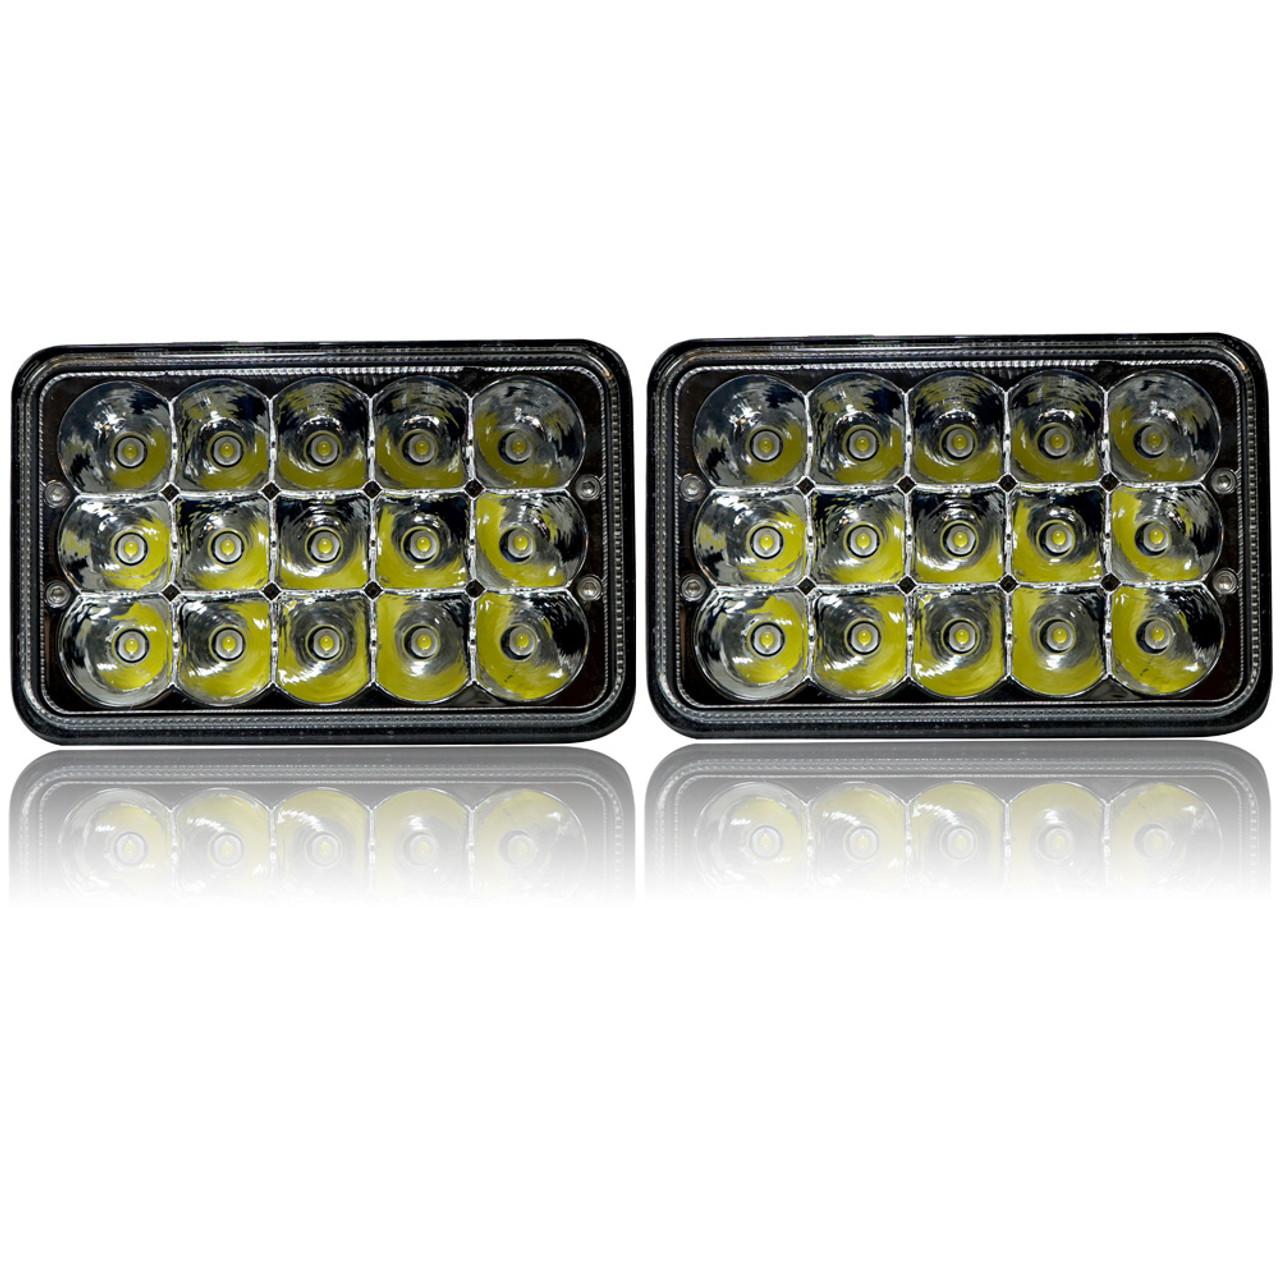 small resolution of 4x6 led array headlights h4651 h4652 h4656 h4666 h6545 chrome set